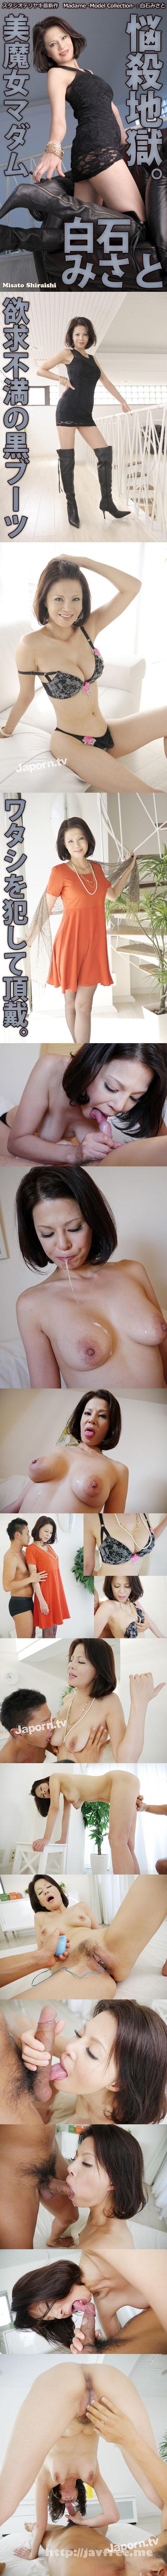 [BT 127] Madame  Model Collection  : 白石みさと 白石みさと Misato Shiraishi BT